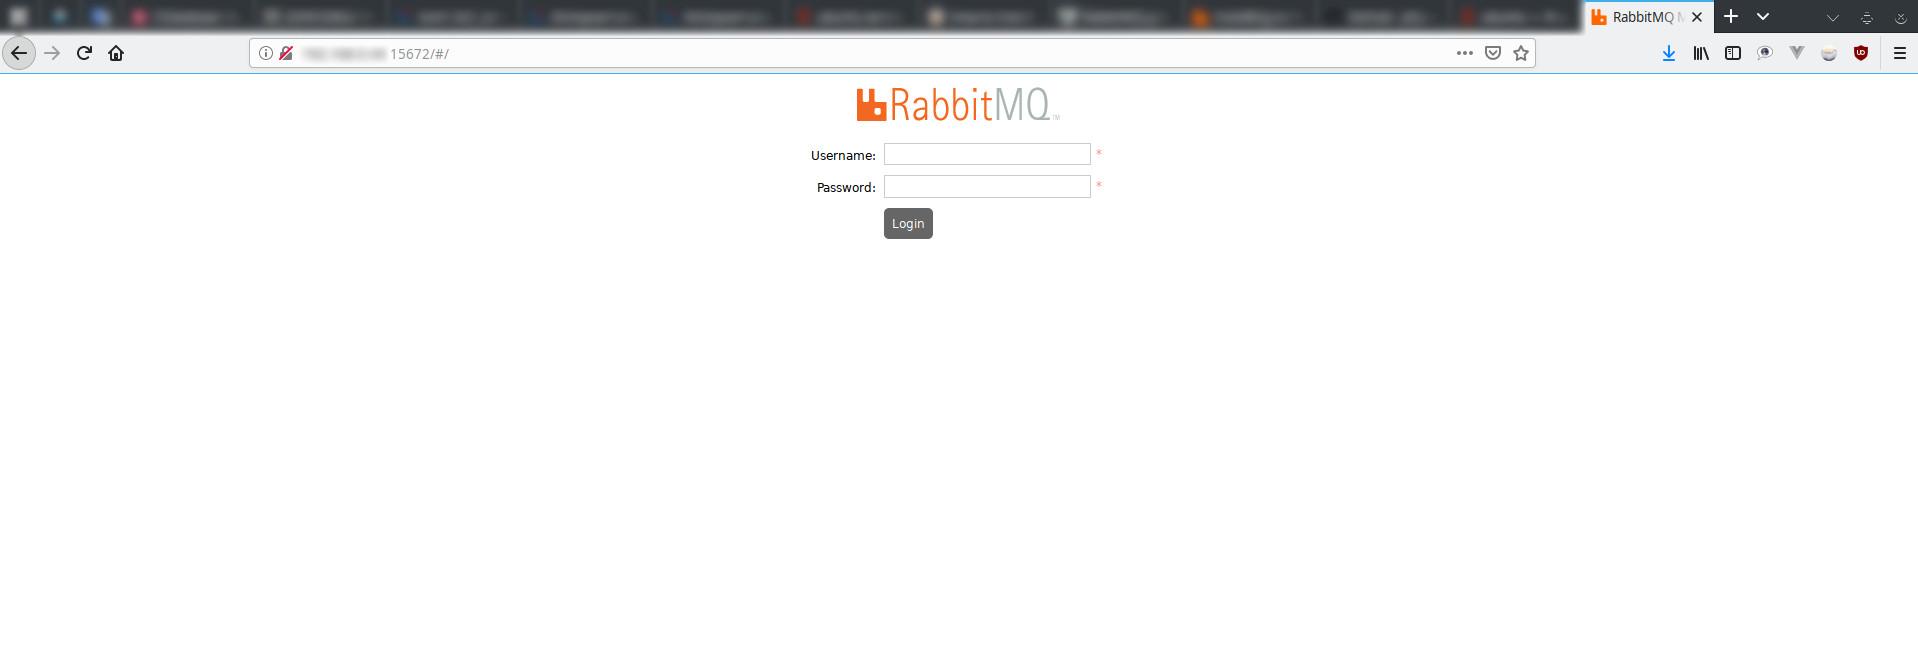 RabbitMQ вход